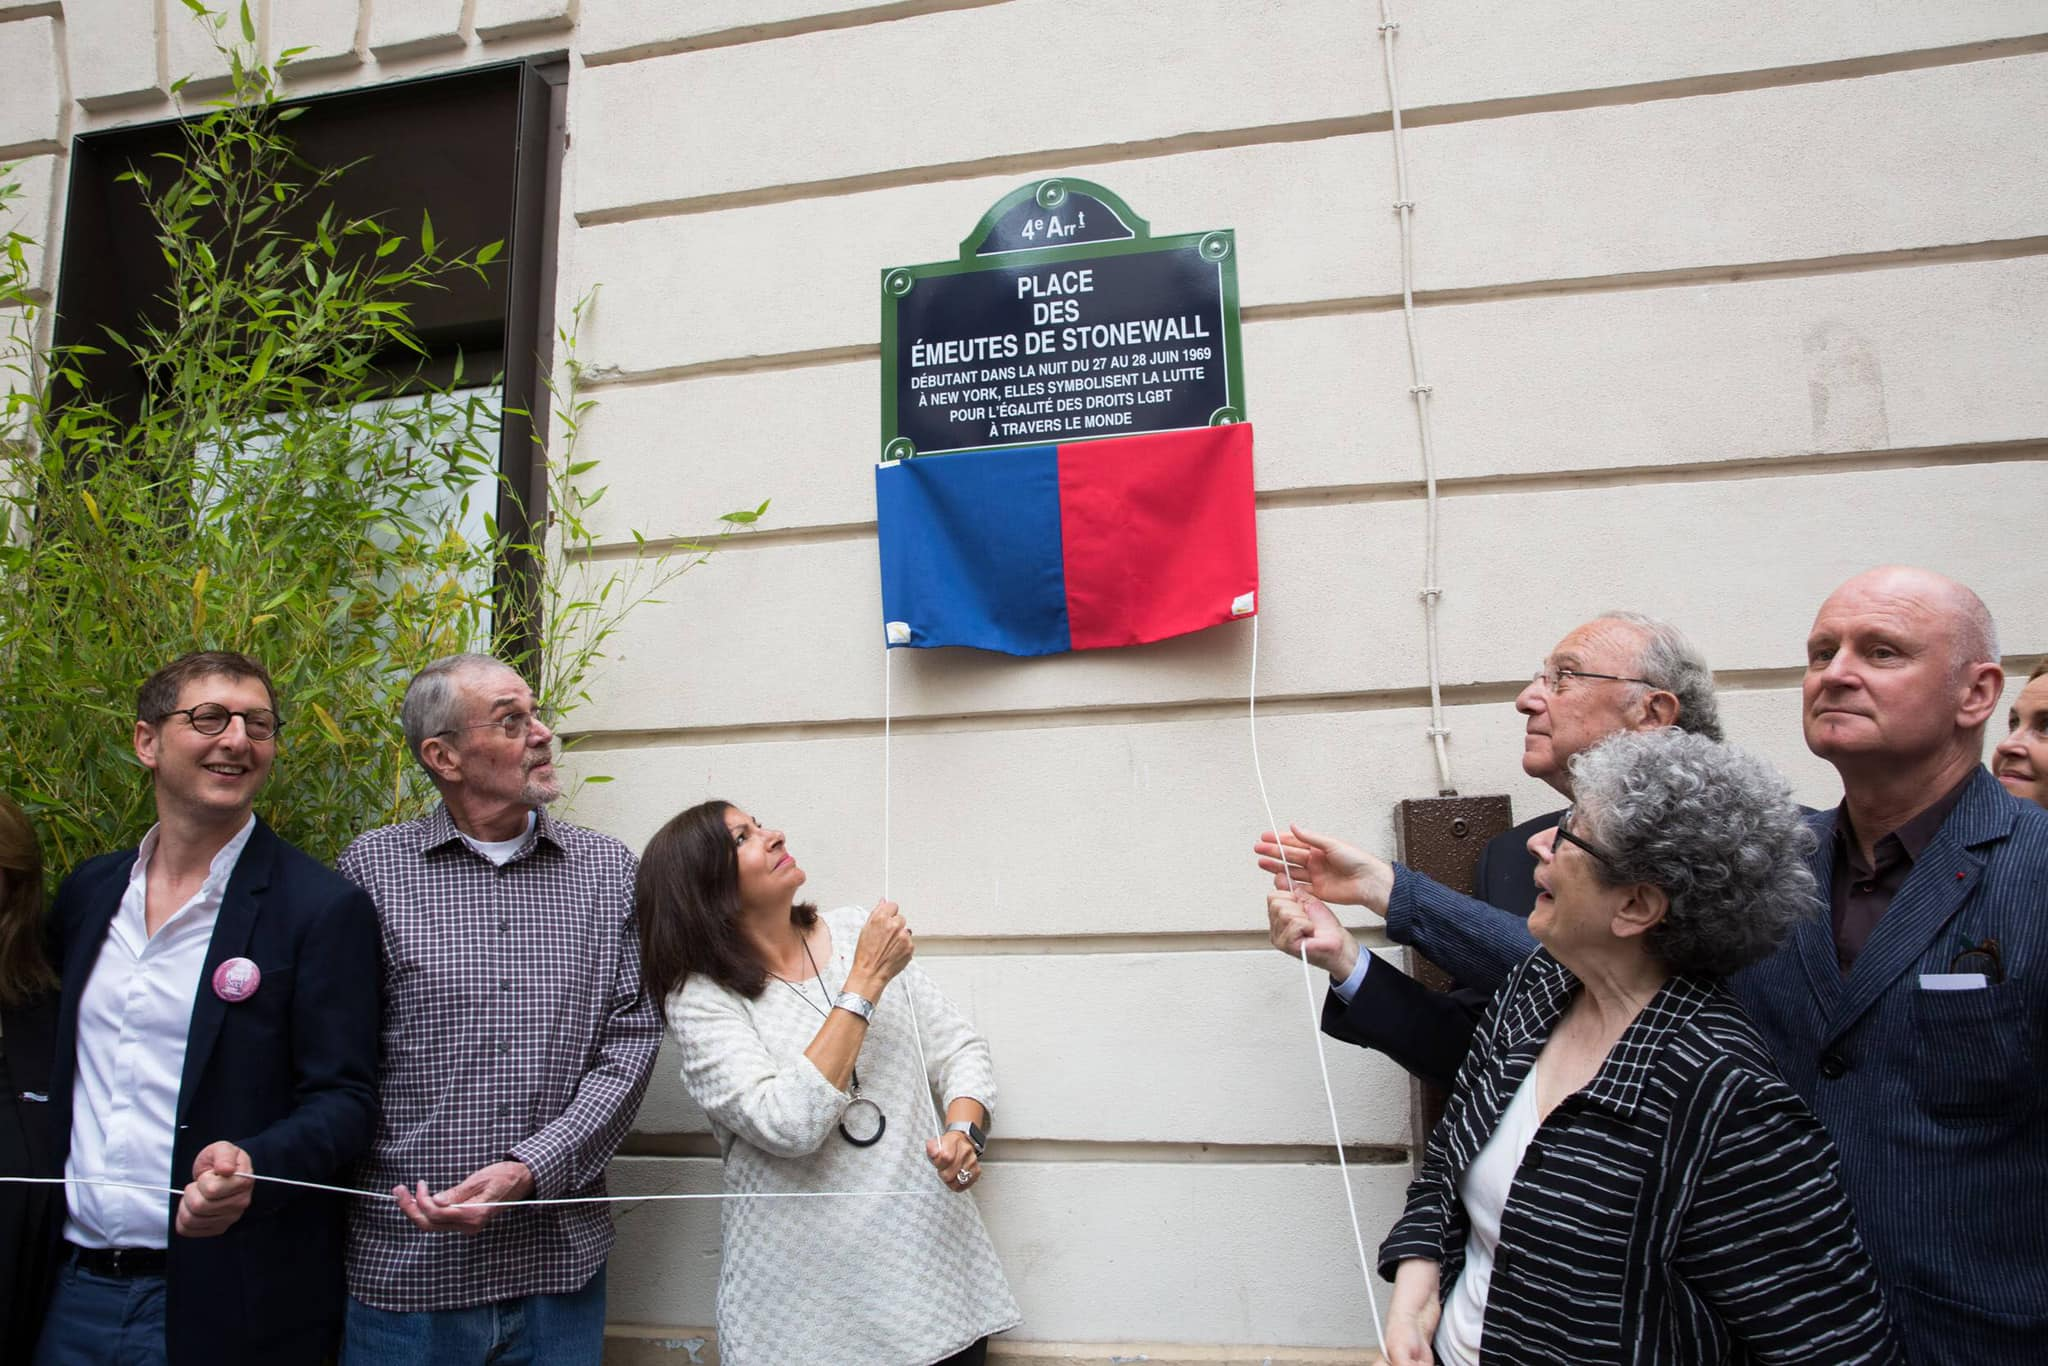 Paris names squares and streets for LGBTQ icons | CNN Travel